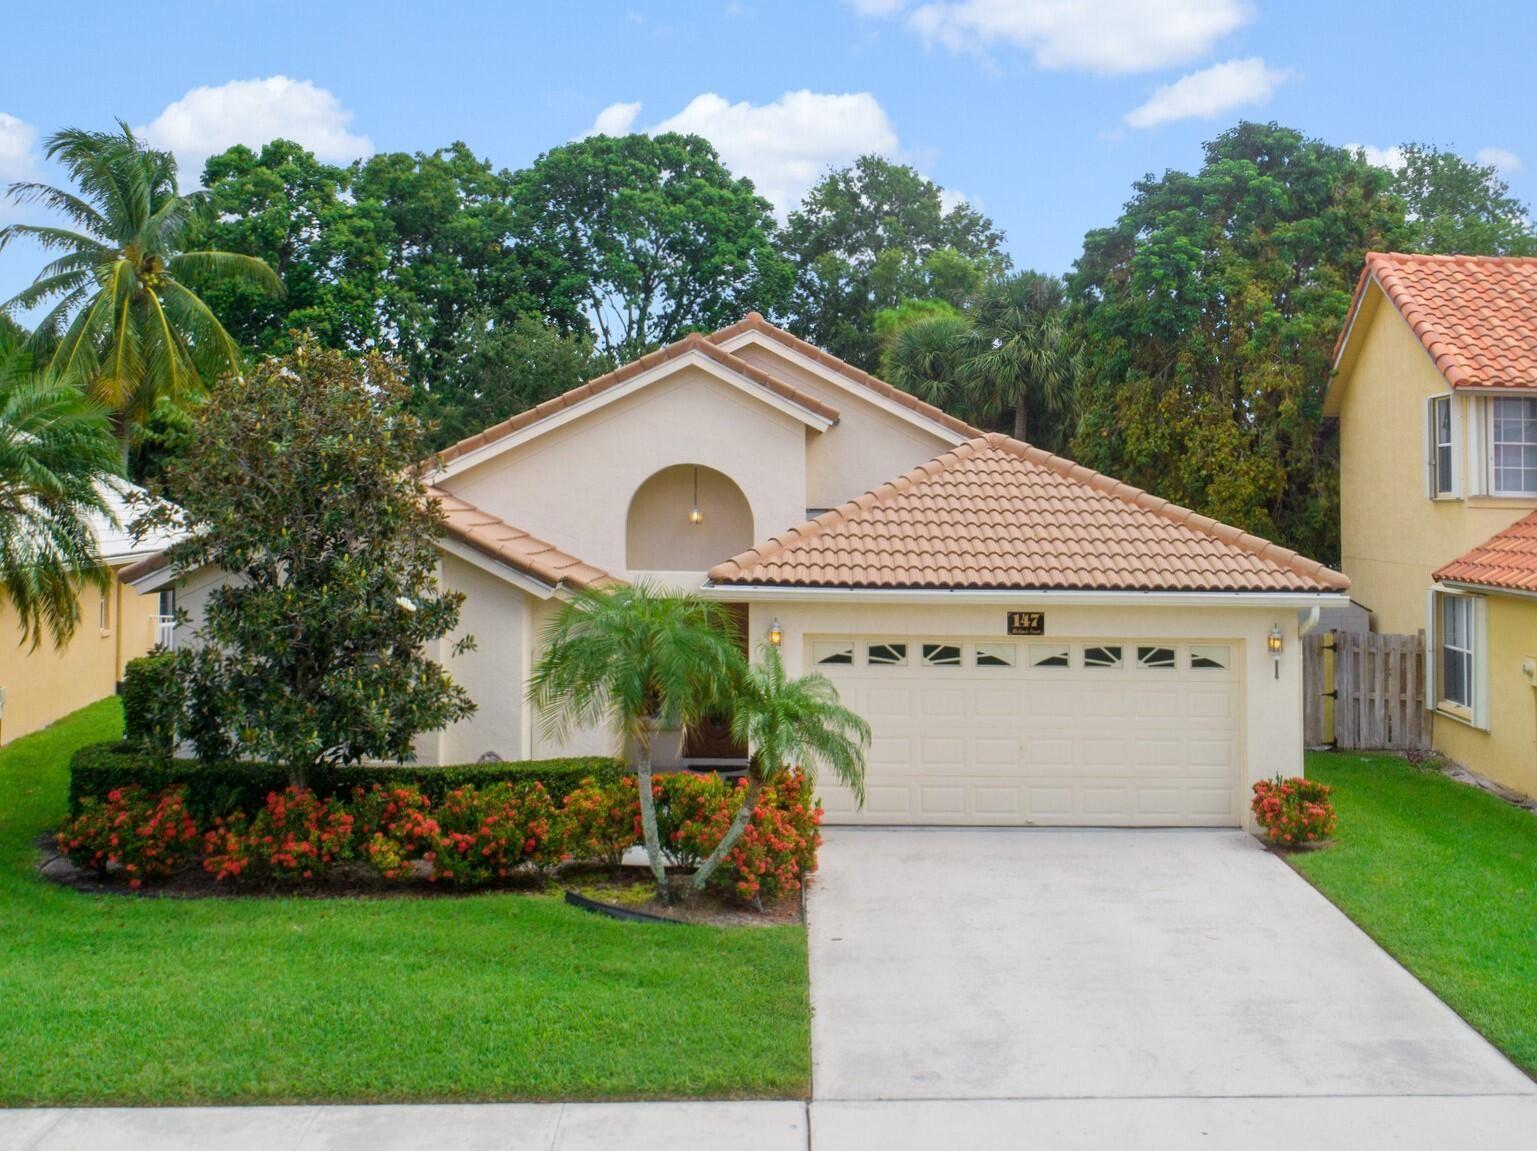 147 St Michaels Court, Jupiter, FL 33458 - MLS#: RX-10746577